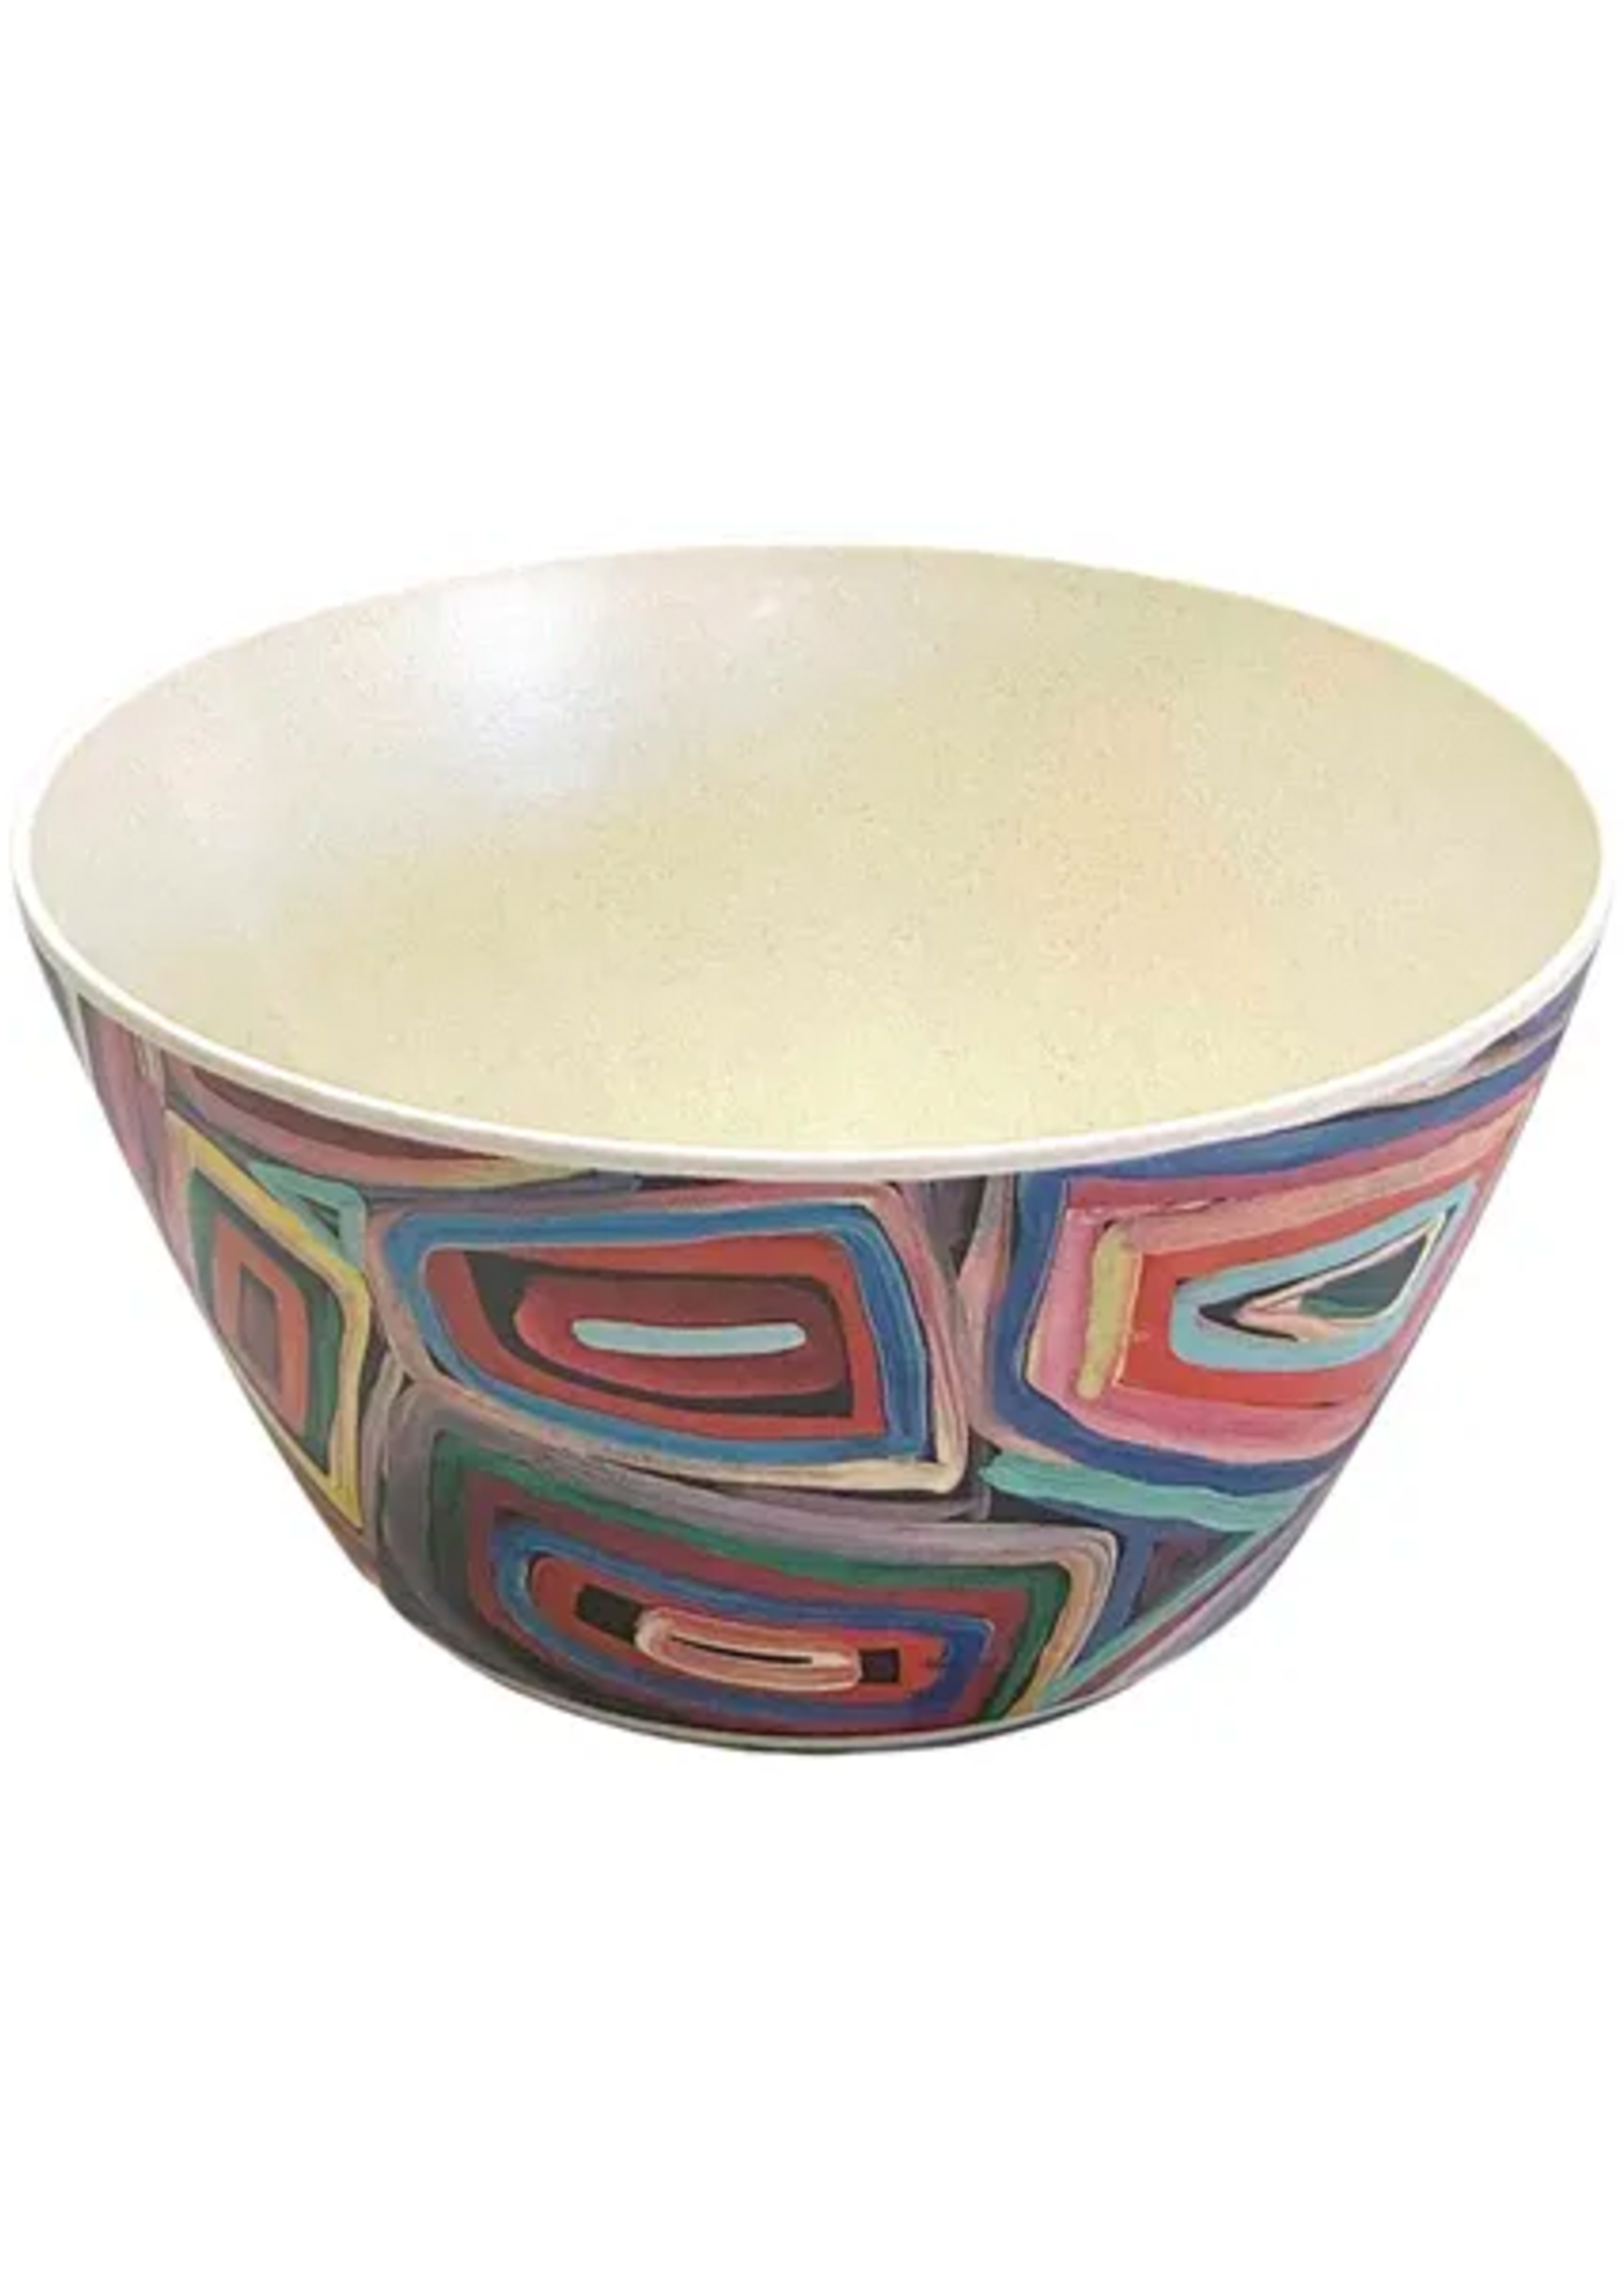 Utopia Bamboo Bowl Small 212 - Janelle Stockman